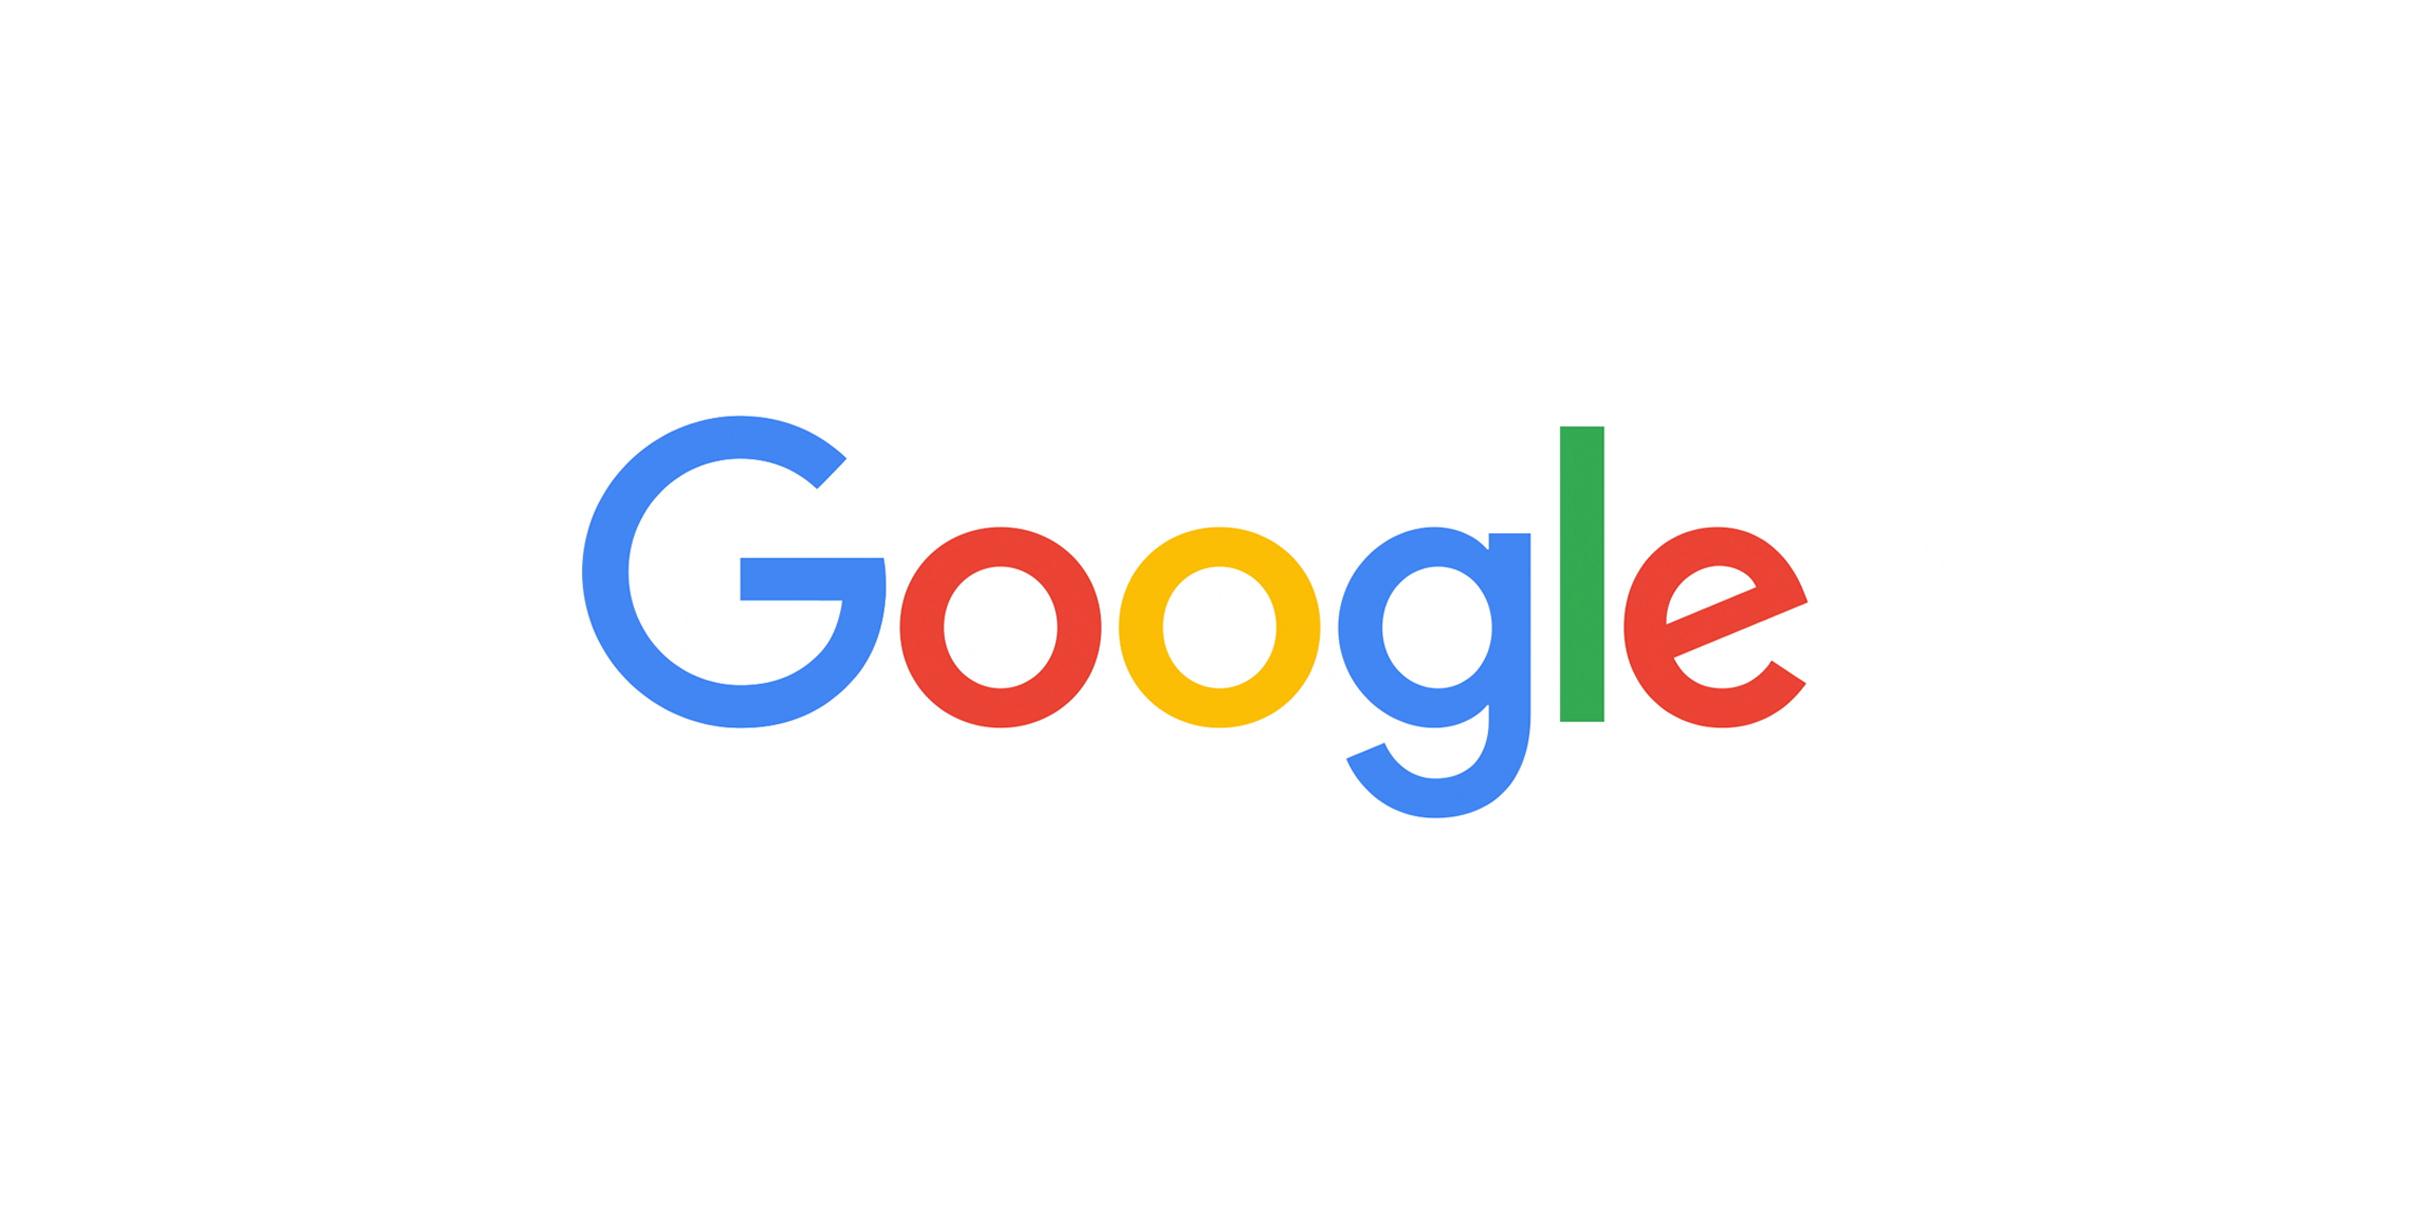 https://mycareersview.com/afile/mcv15154_evolving_google_identity_2x1.jpg